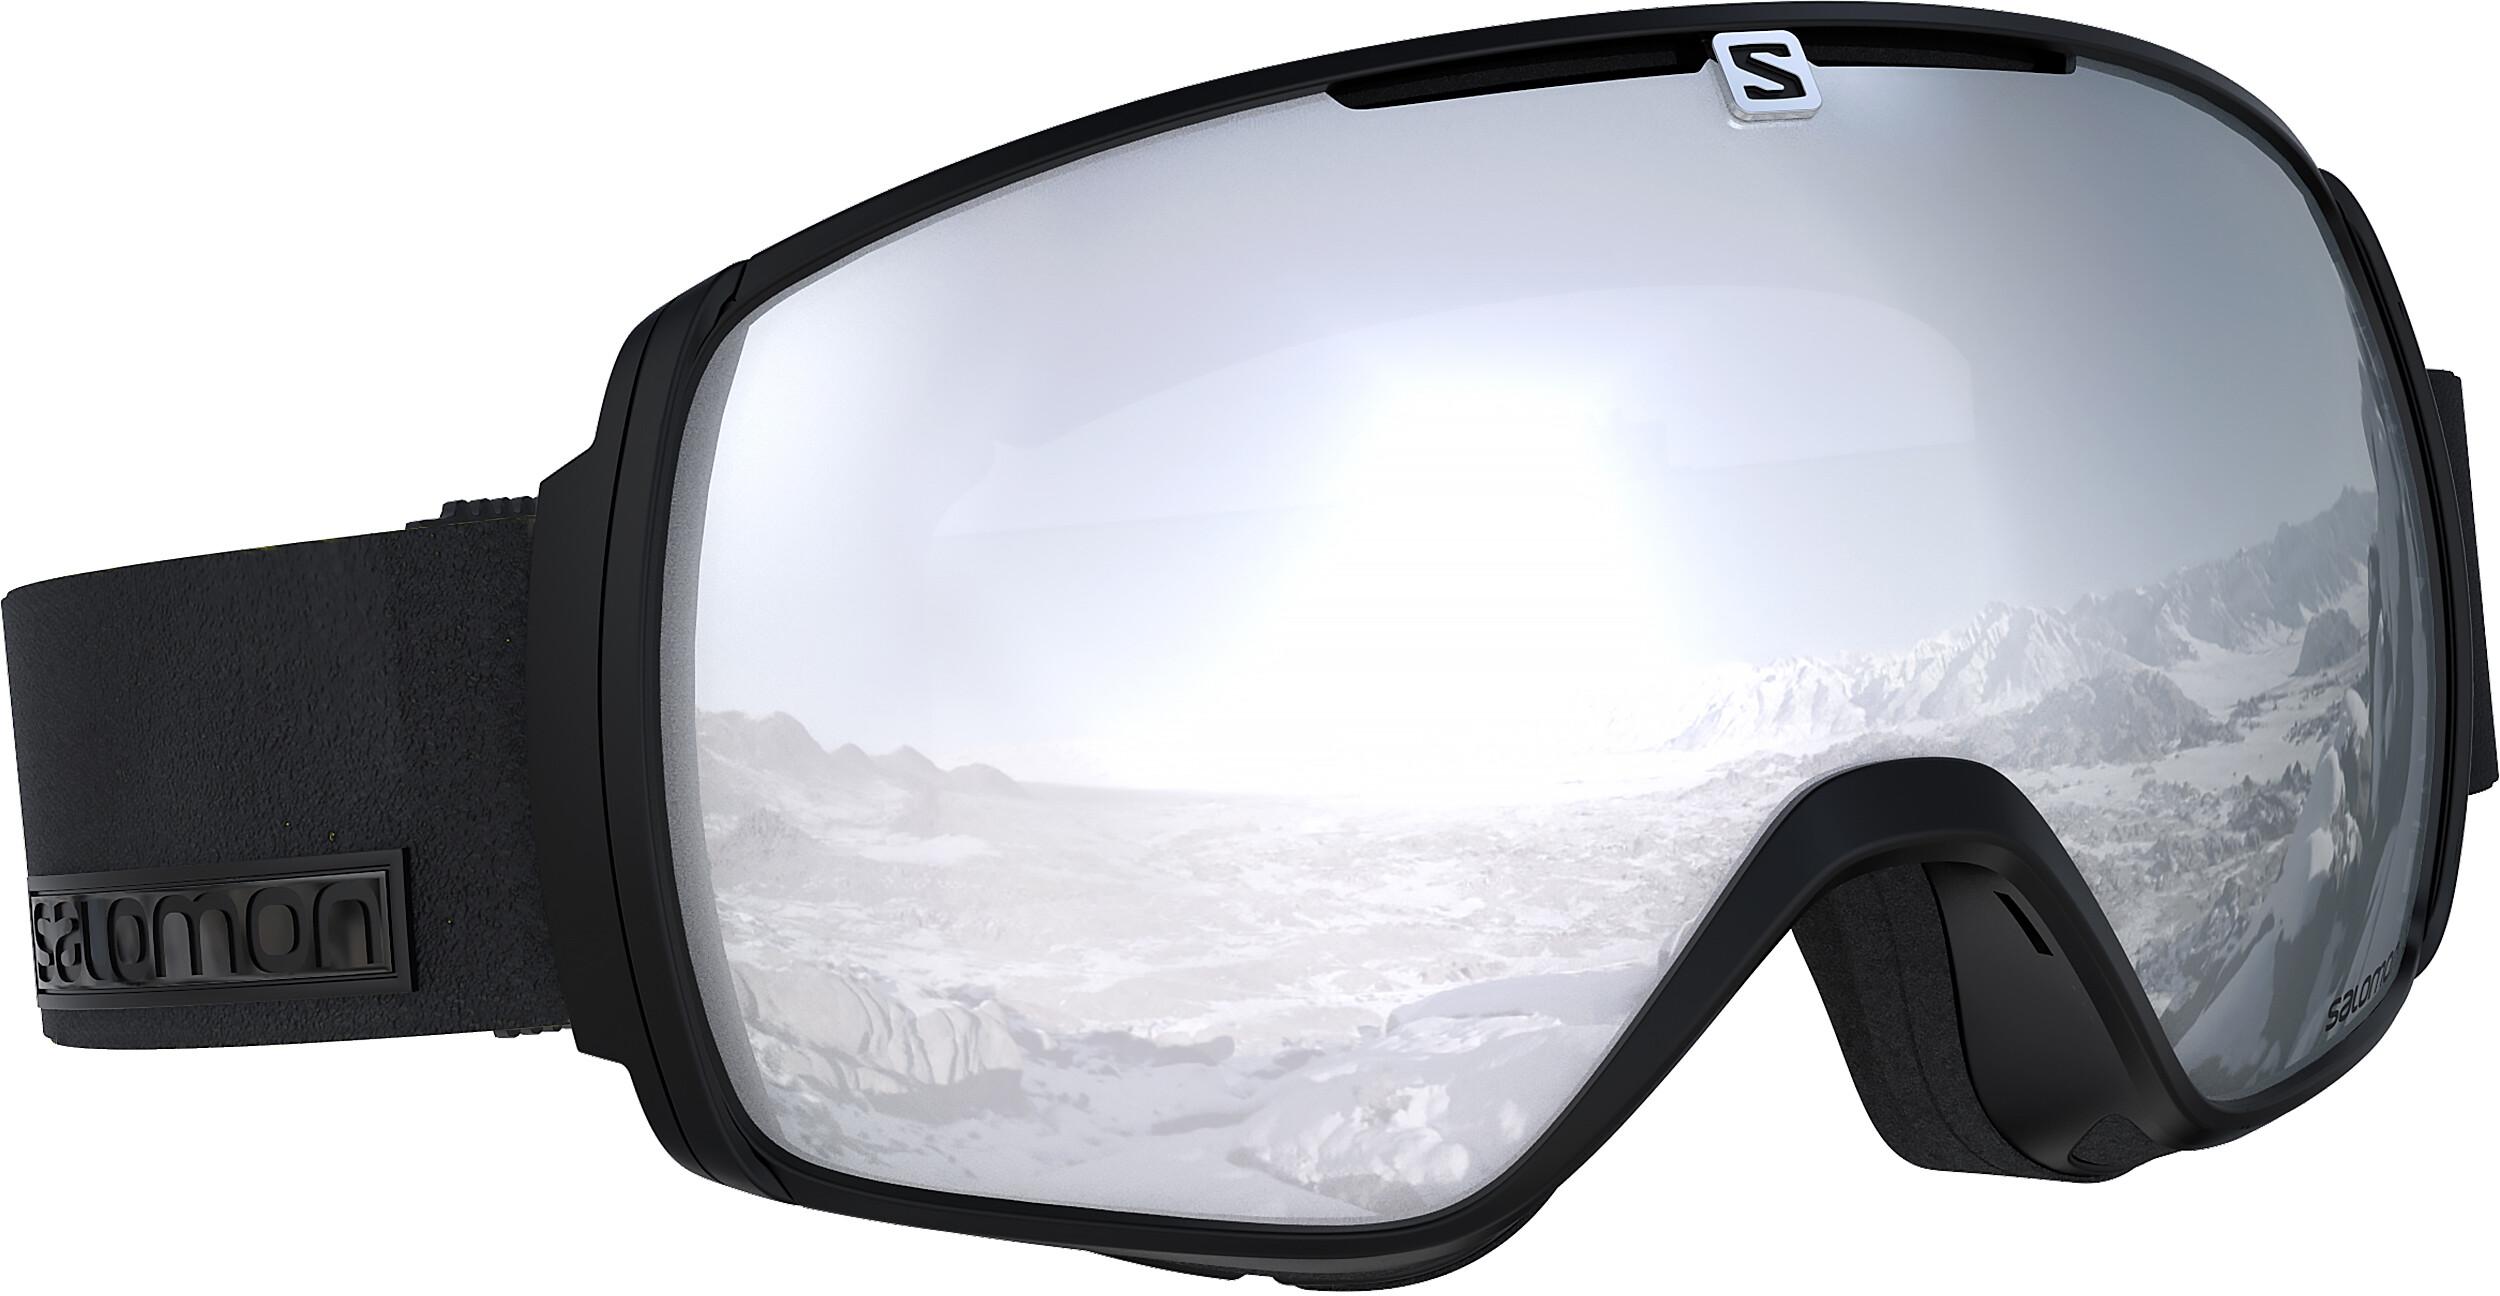 Salomon XT One Goggles Black Tie - addnature.com 6f2ff566b7253